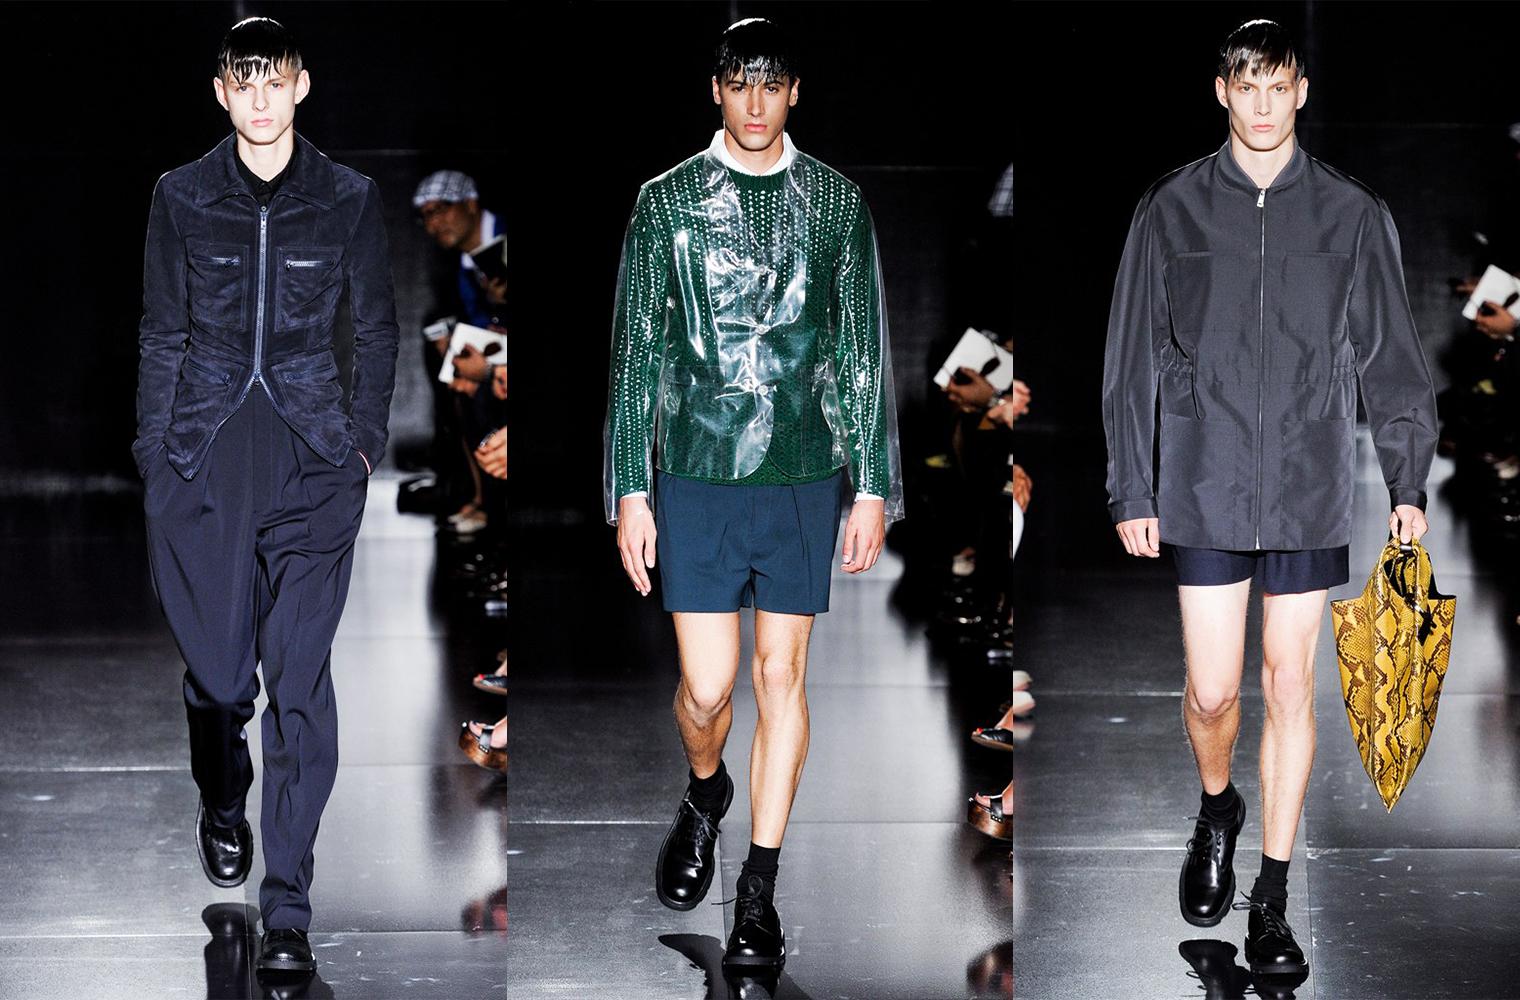 Раф Симонс для Jil Sander Spring/Summer 2012 Menswear